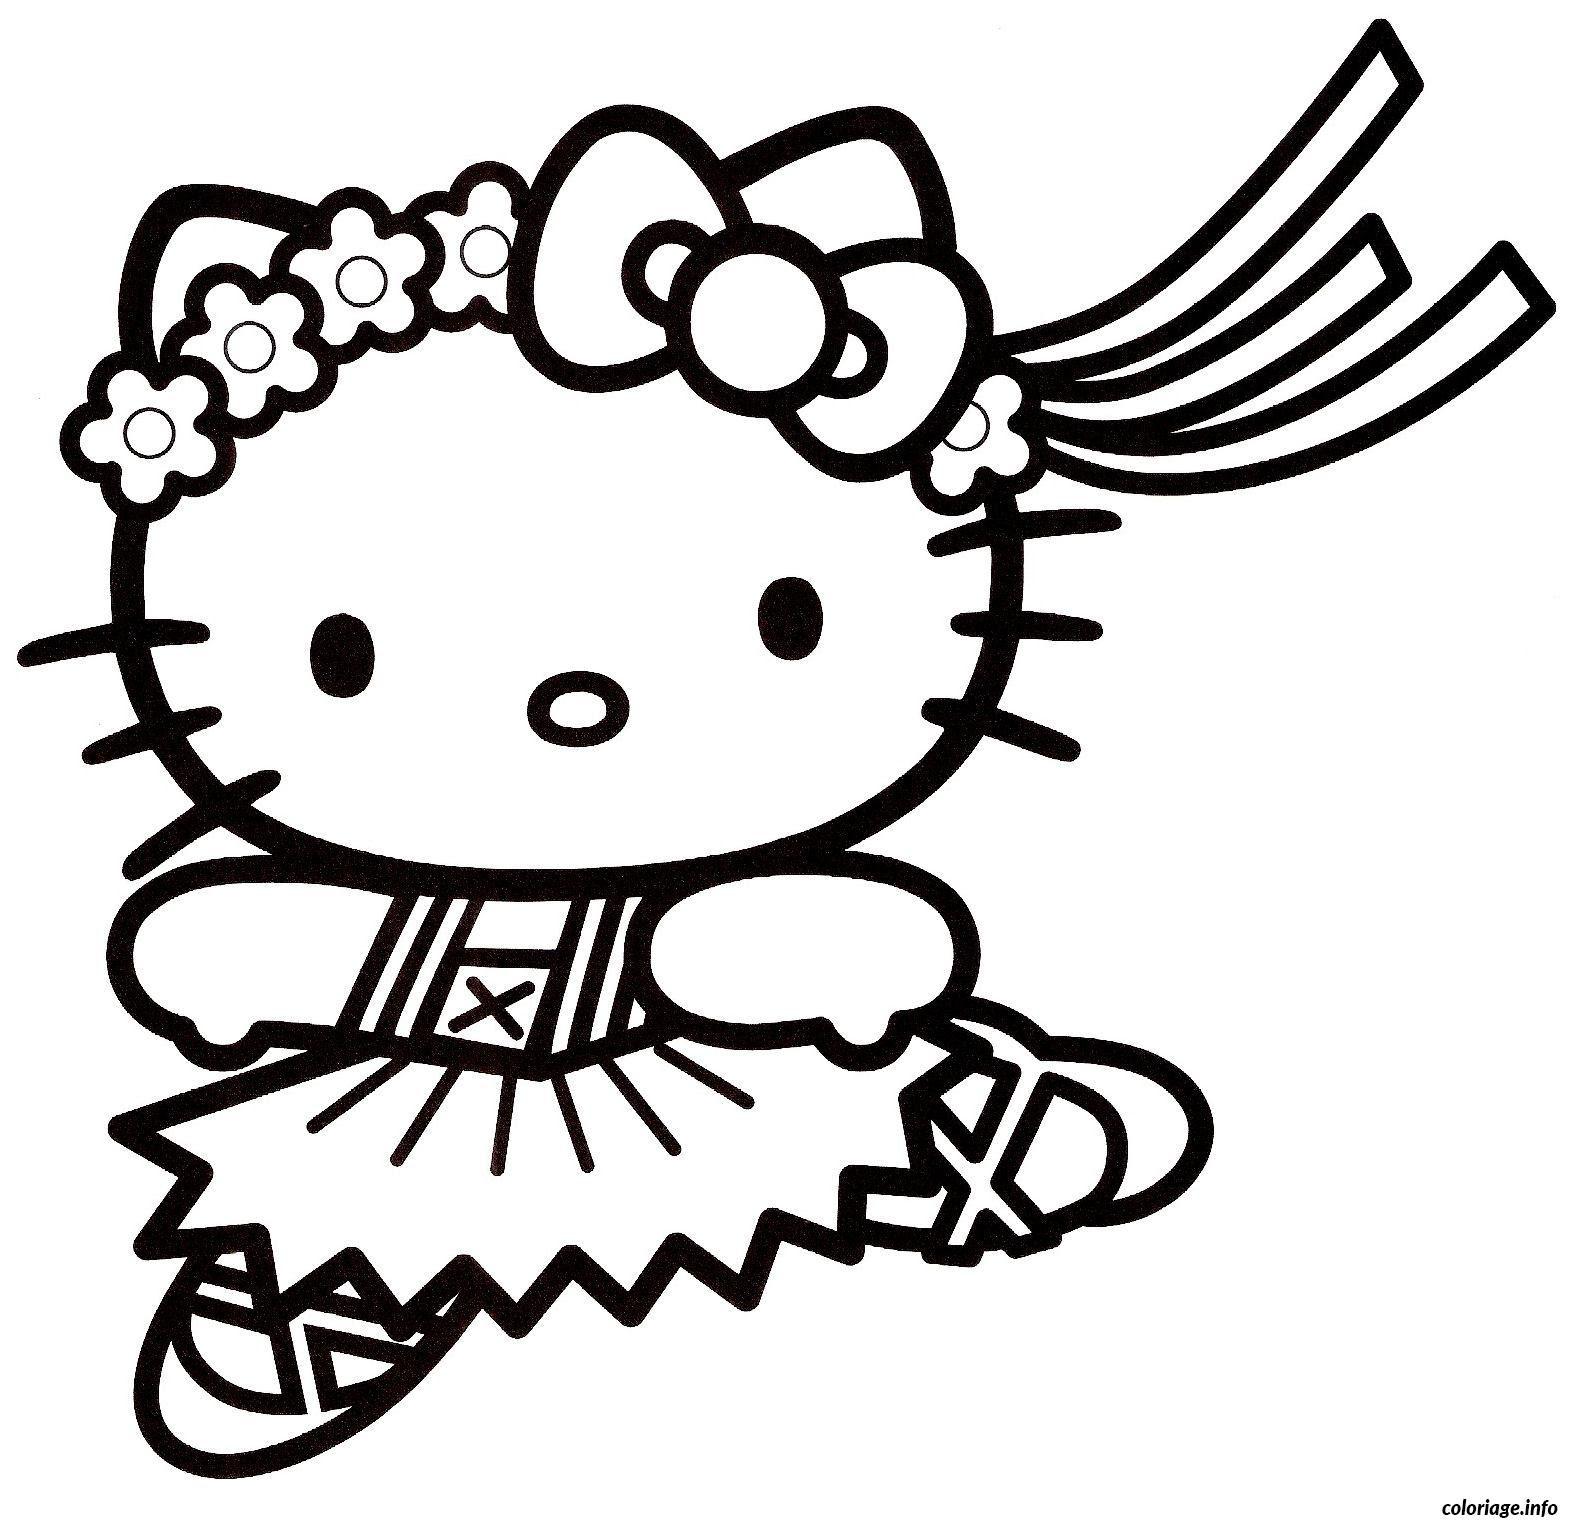 Coloriage Dessin Hello Kitty 3 Jecoloriecom